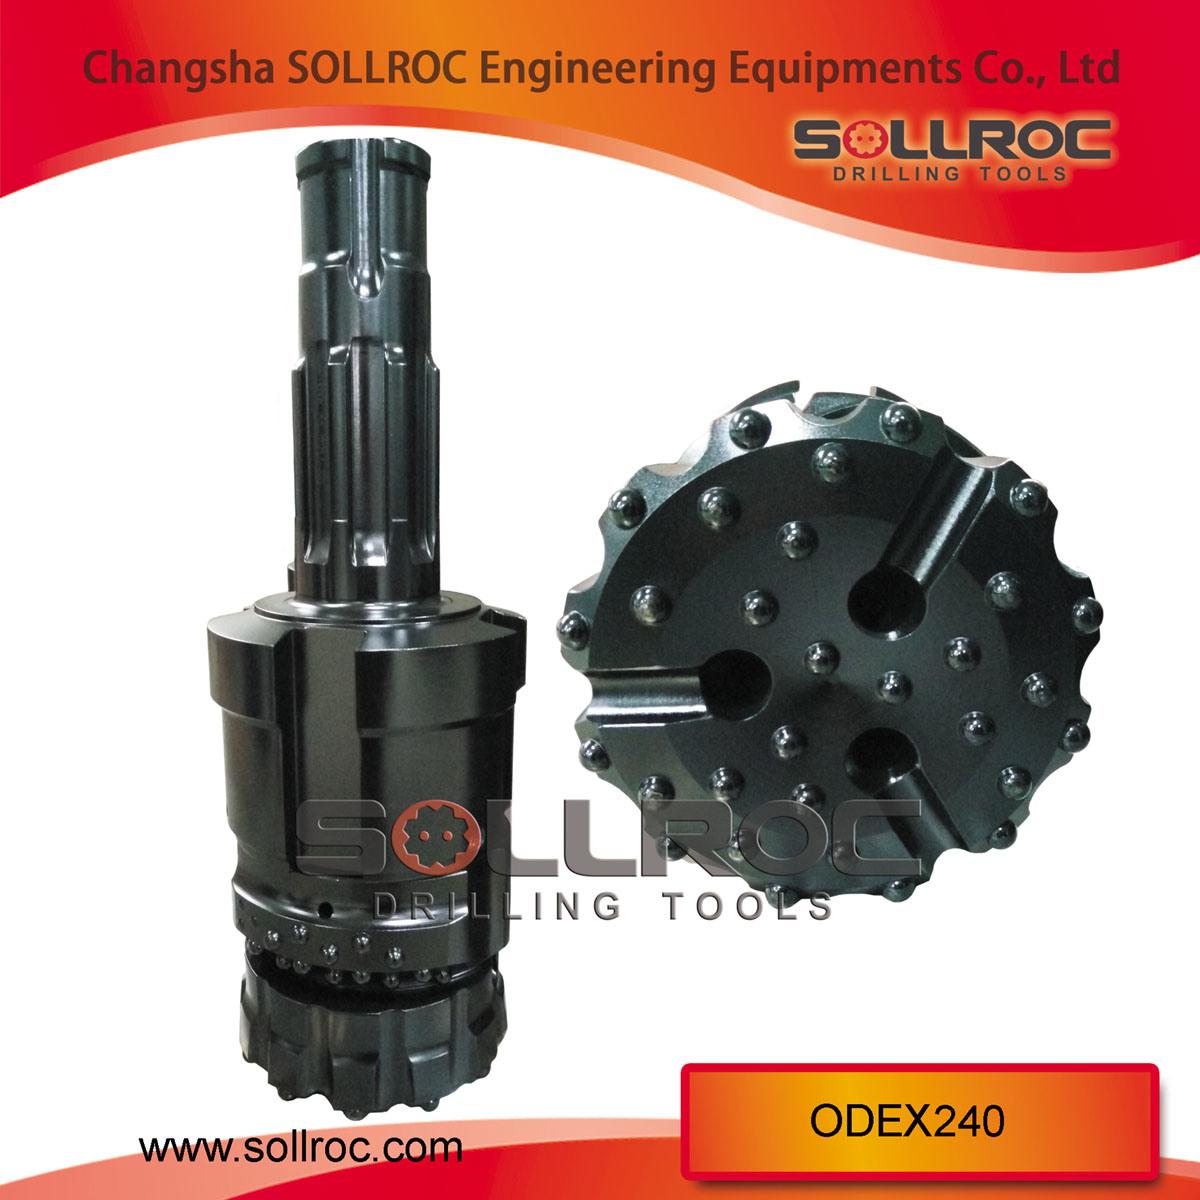 Odex165 Overburden Casing Drilling System